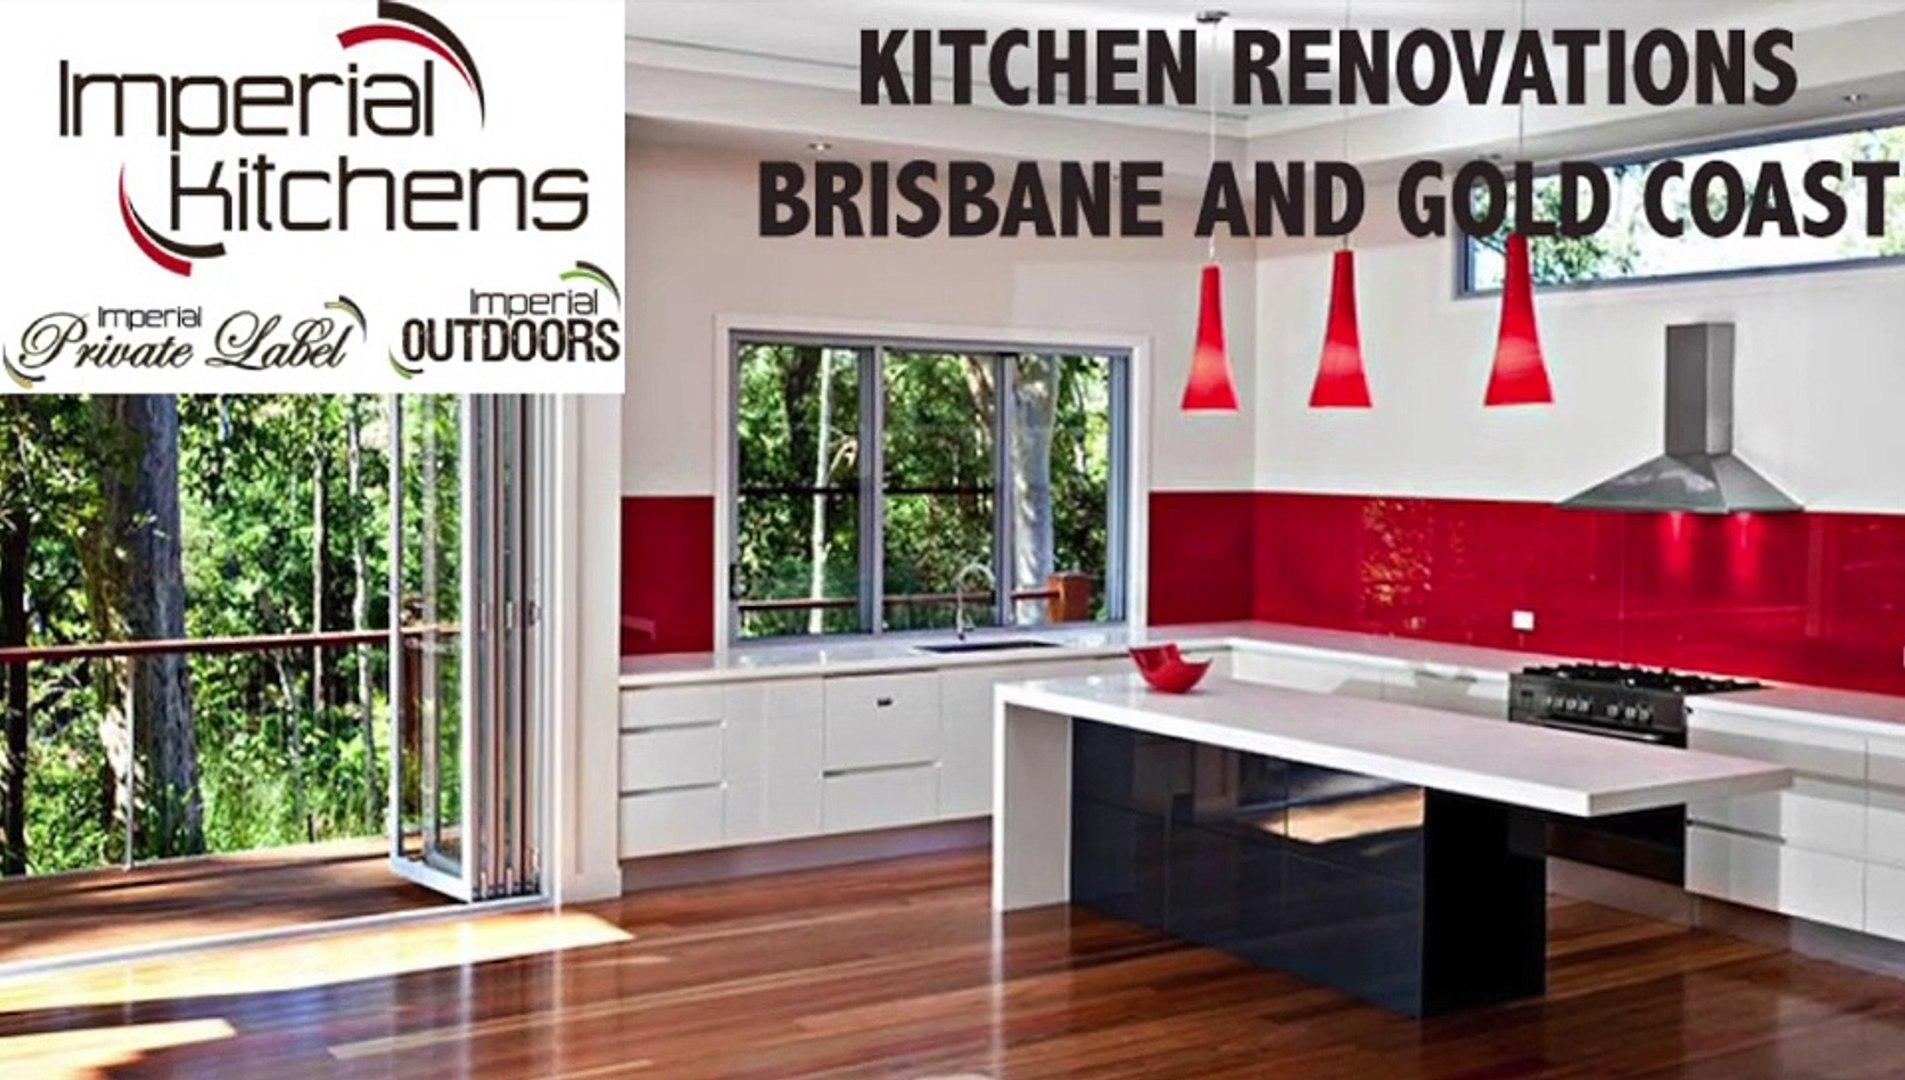 Kitchen Renovations Brisbane and Gold Coast